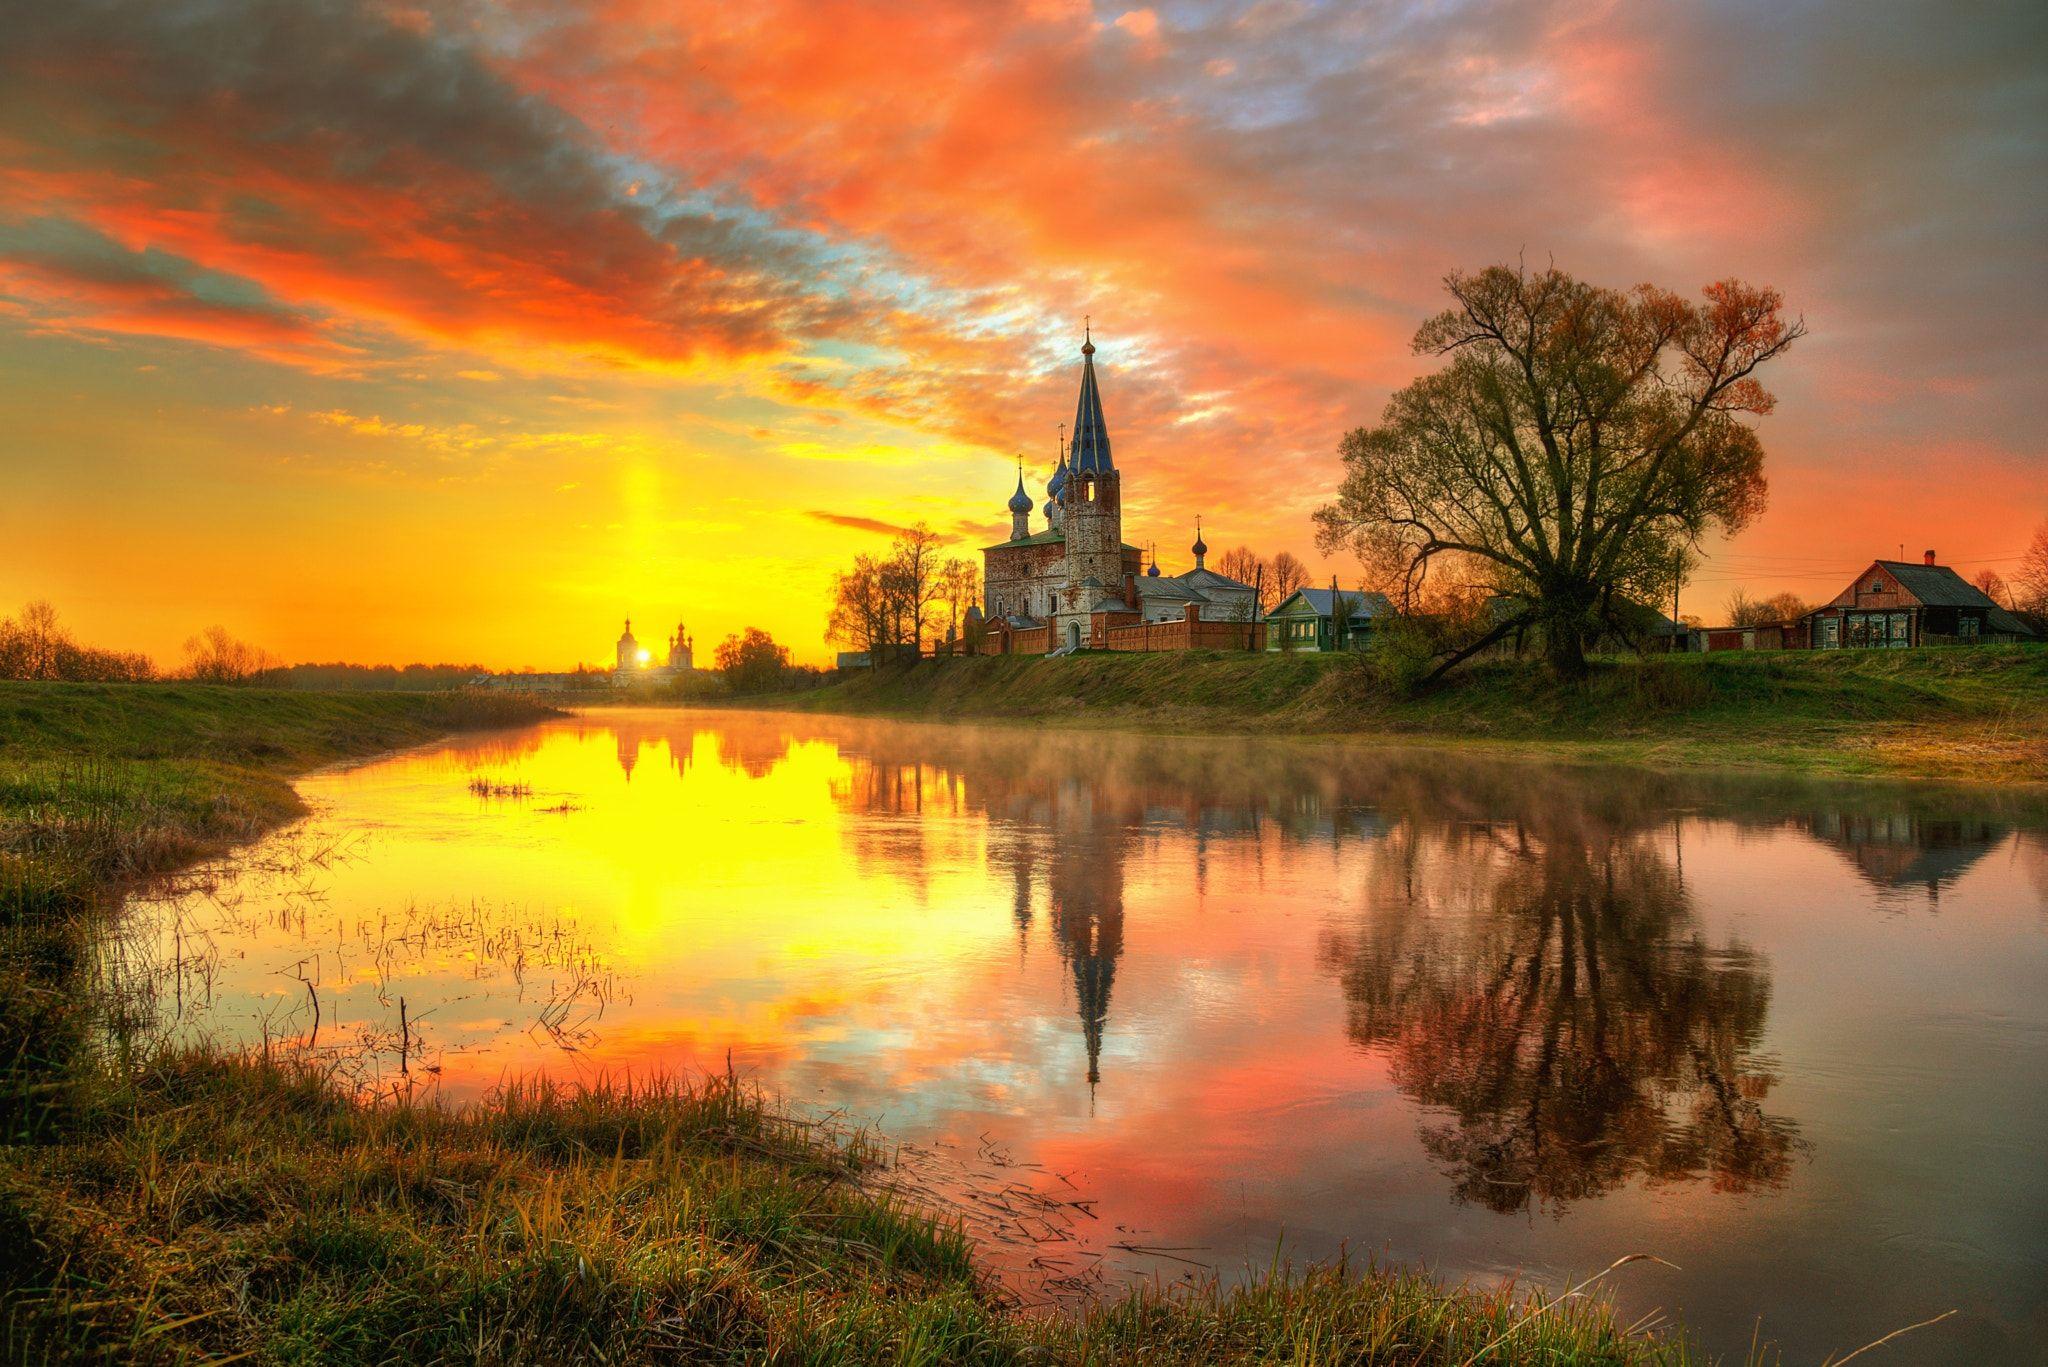 майский рассвет в селе Дунилово_Russia by Ed Gordeev on ...